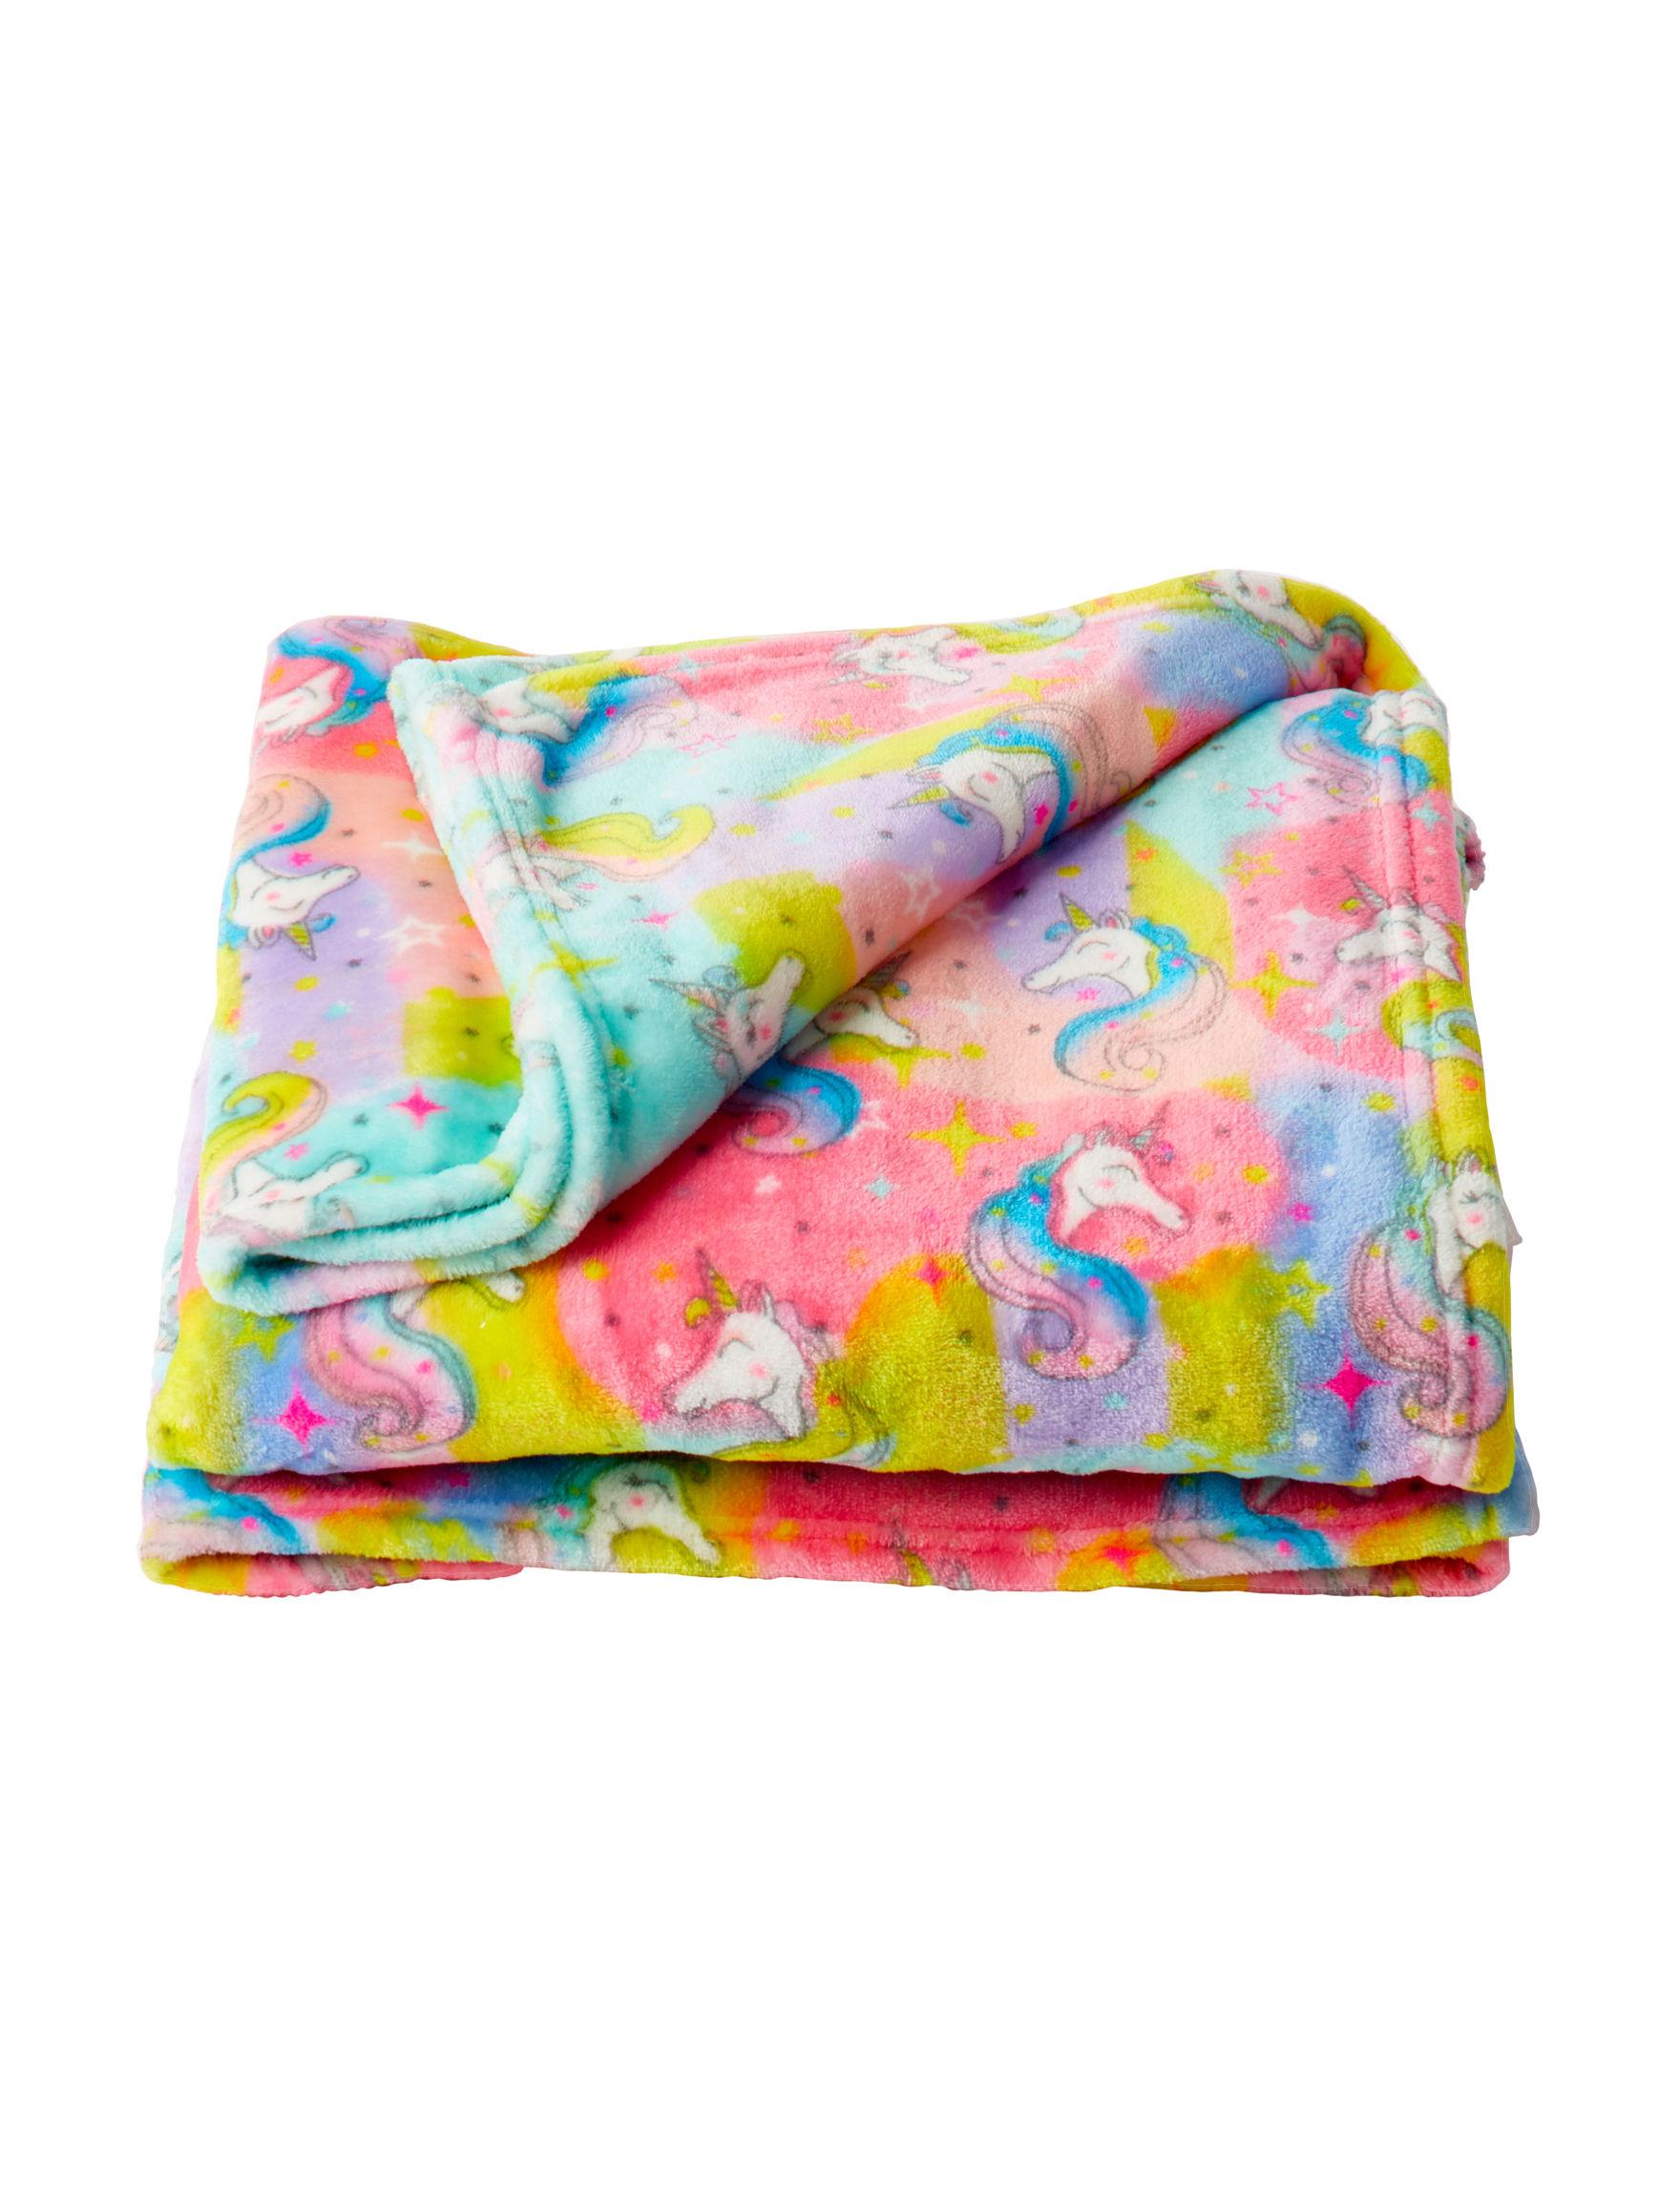 Mystic Apparel Rainbow Blankets & Throws